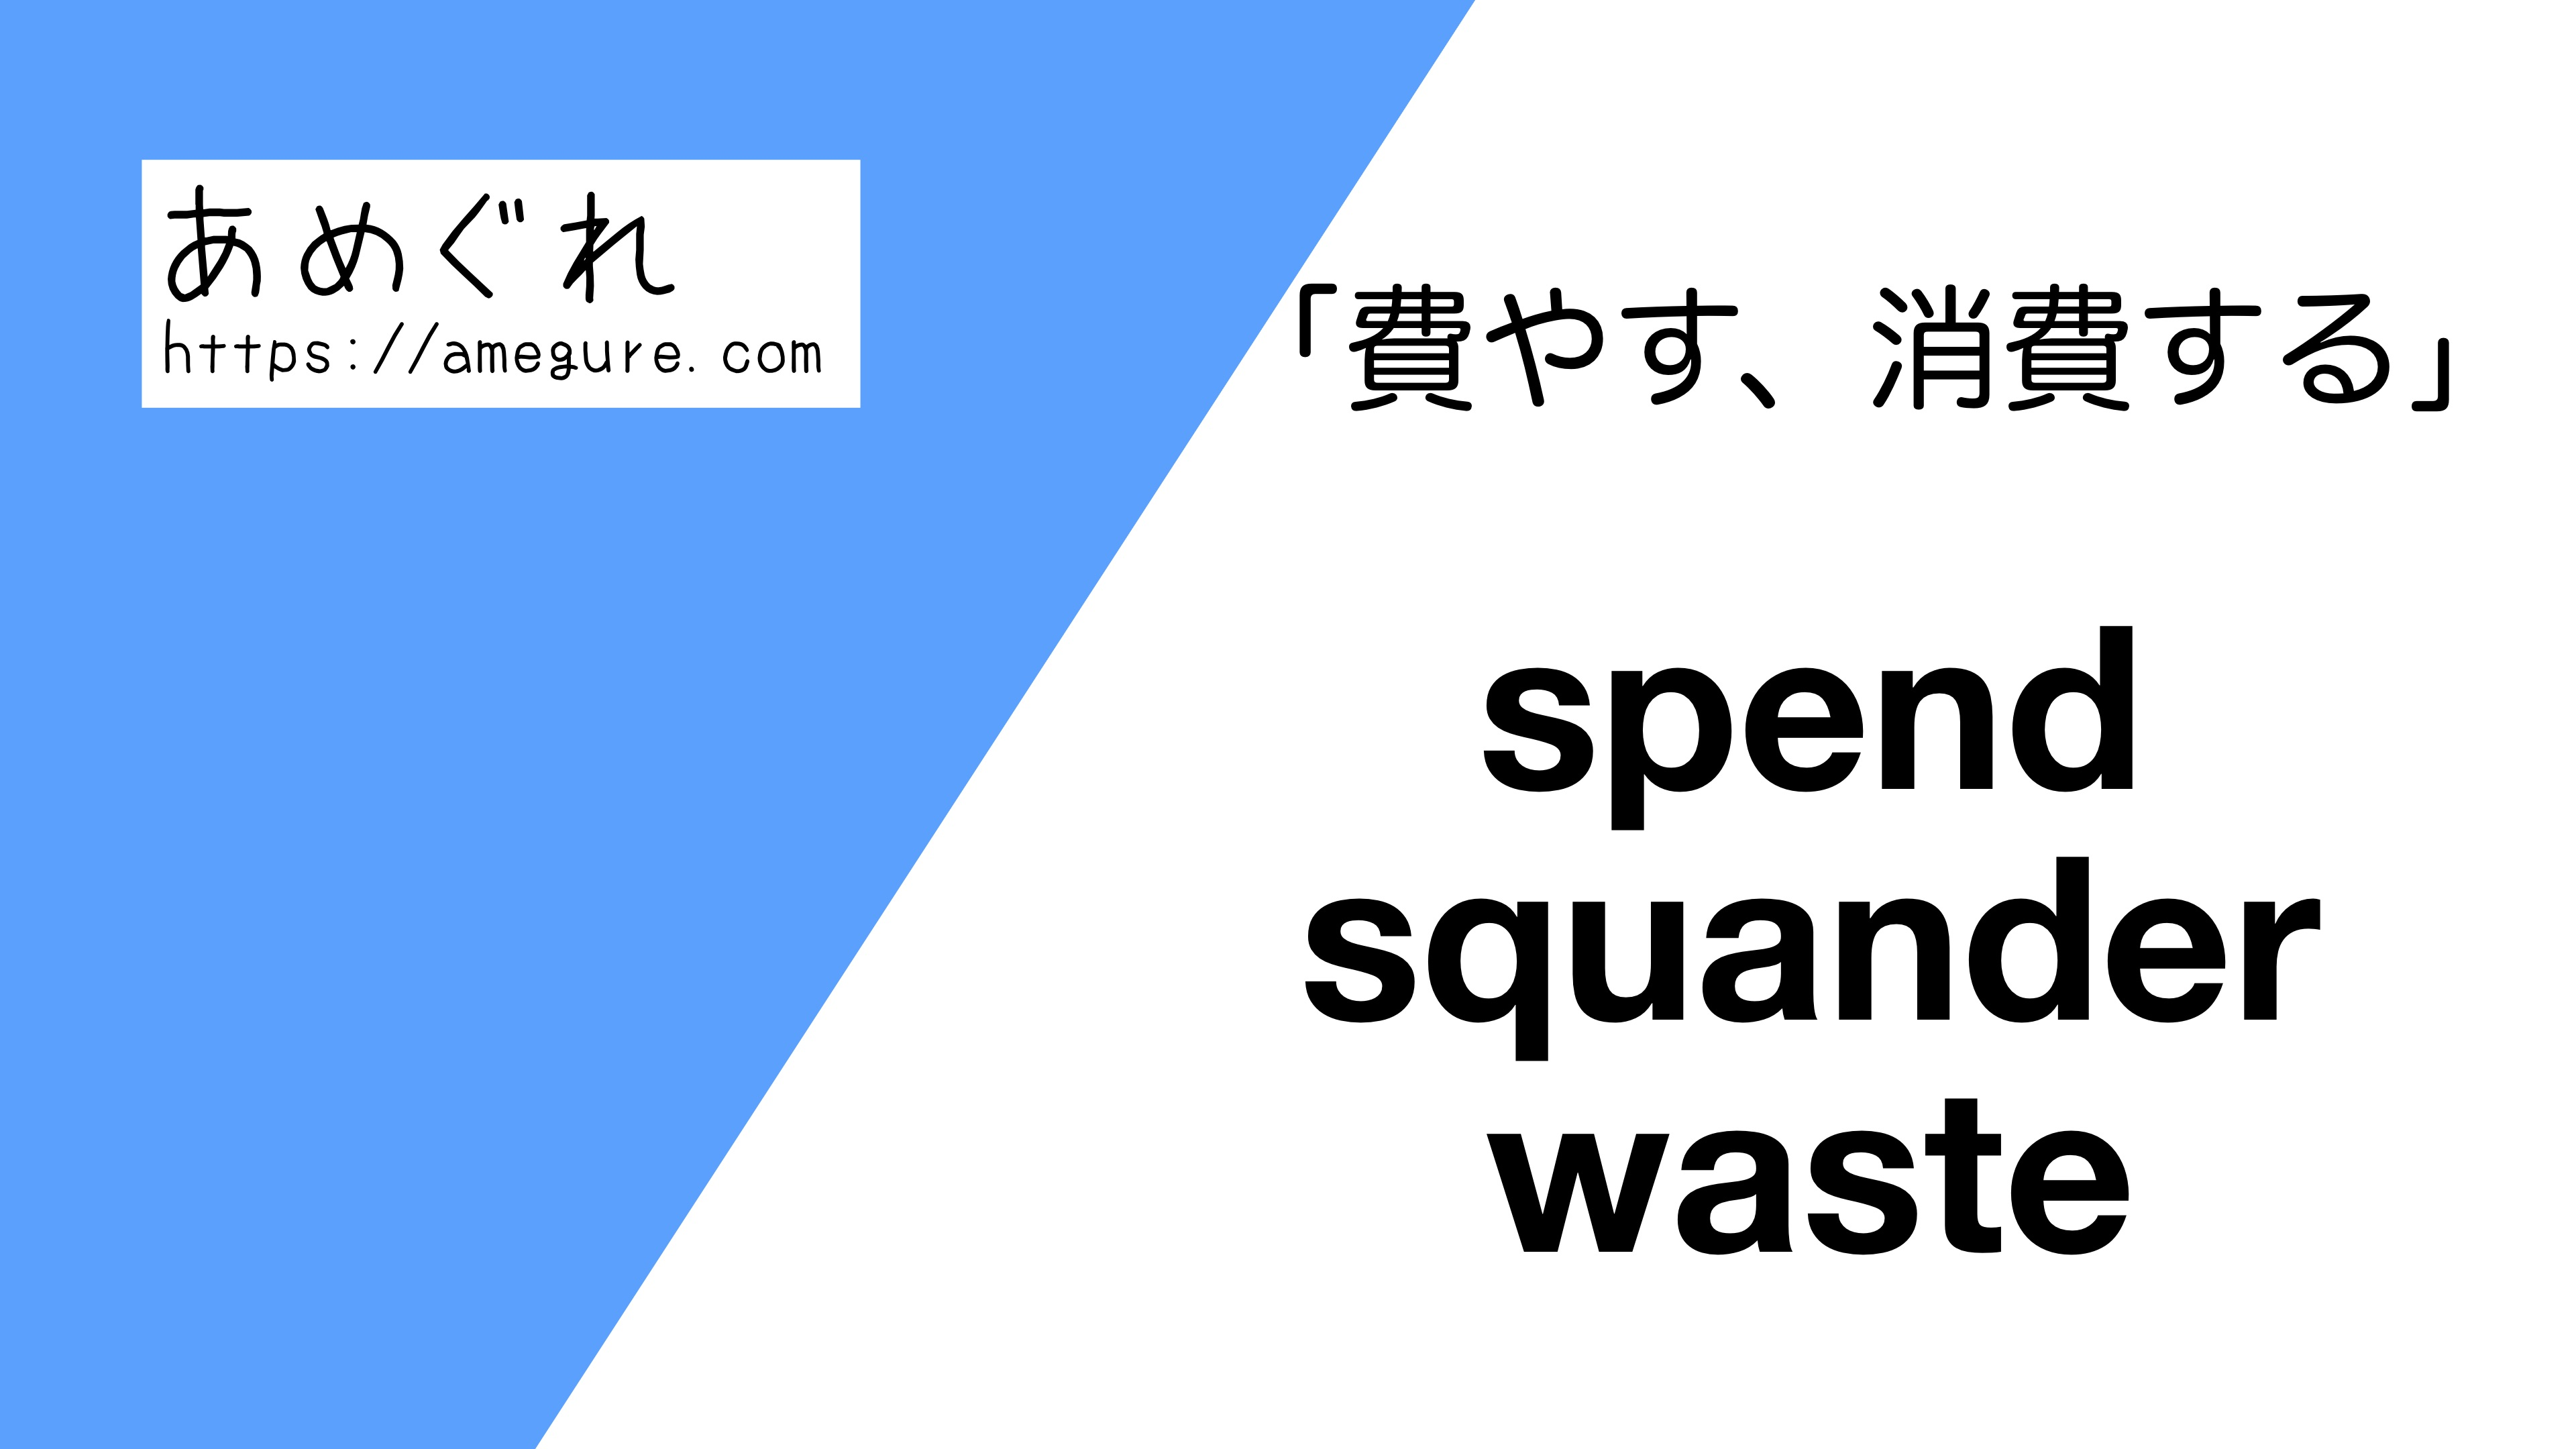 spend-squander-waste違い